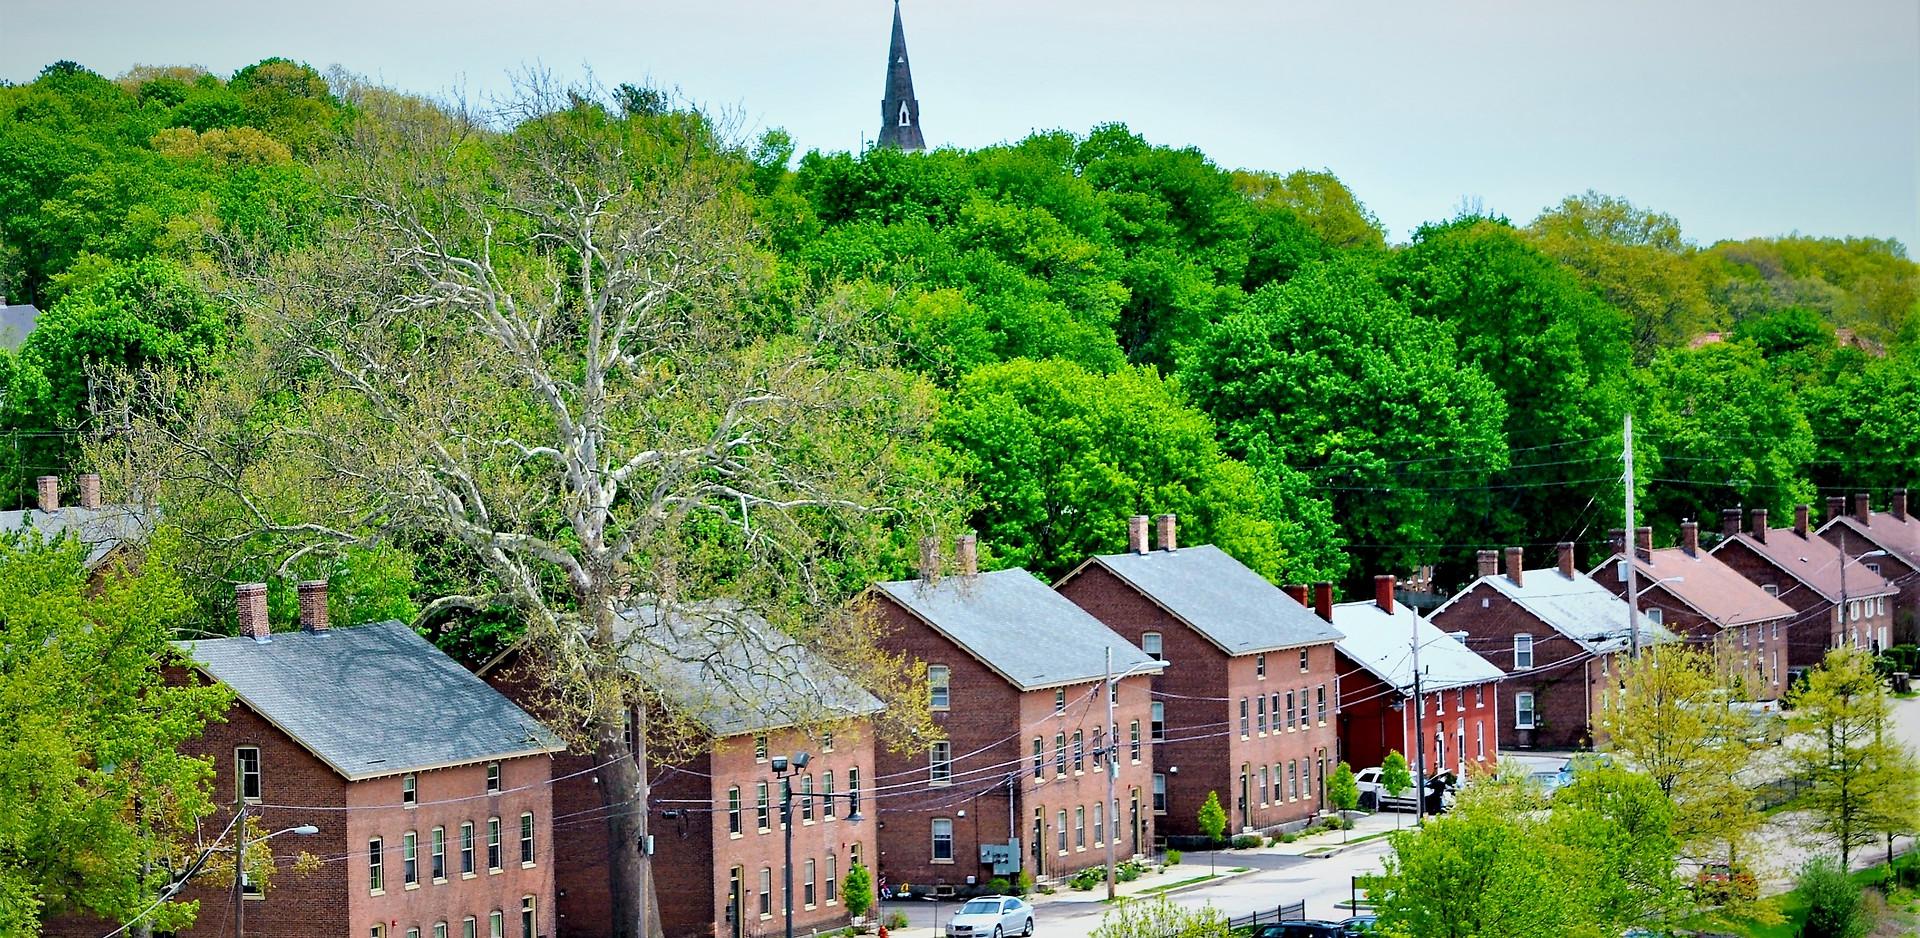 Ashton Village, Cumberland, RI